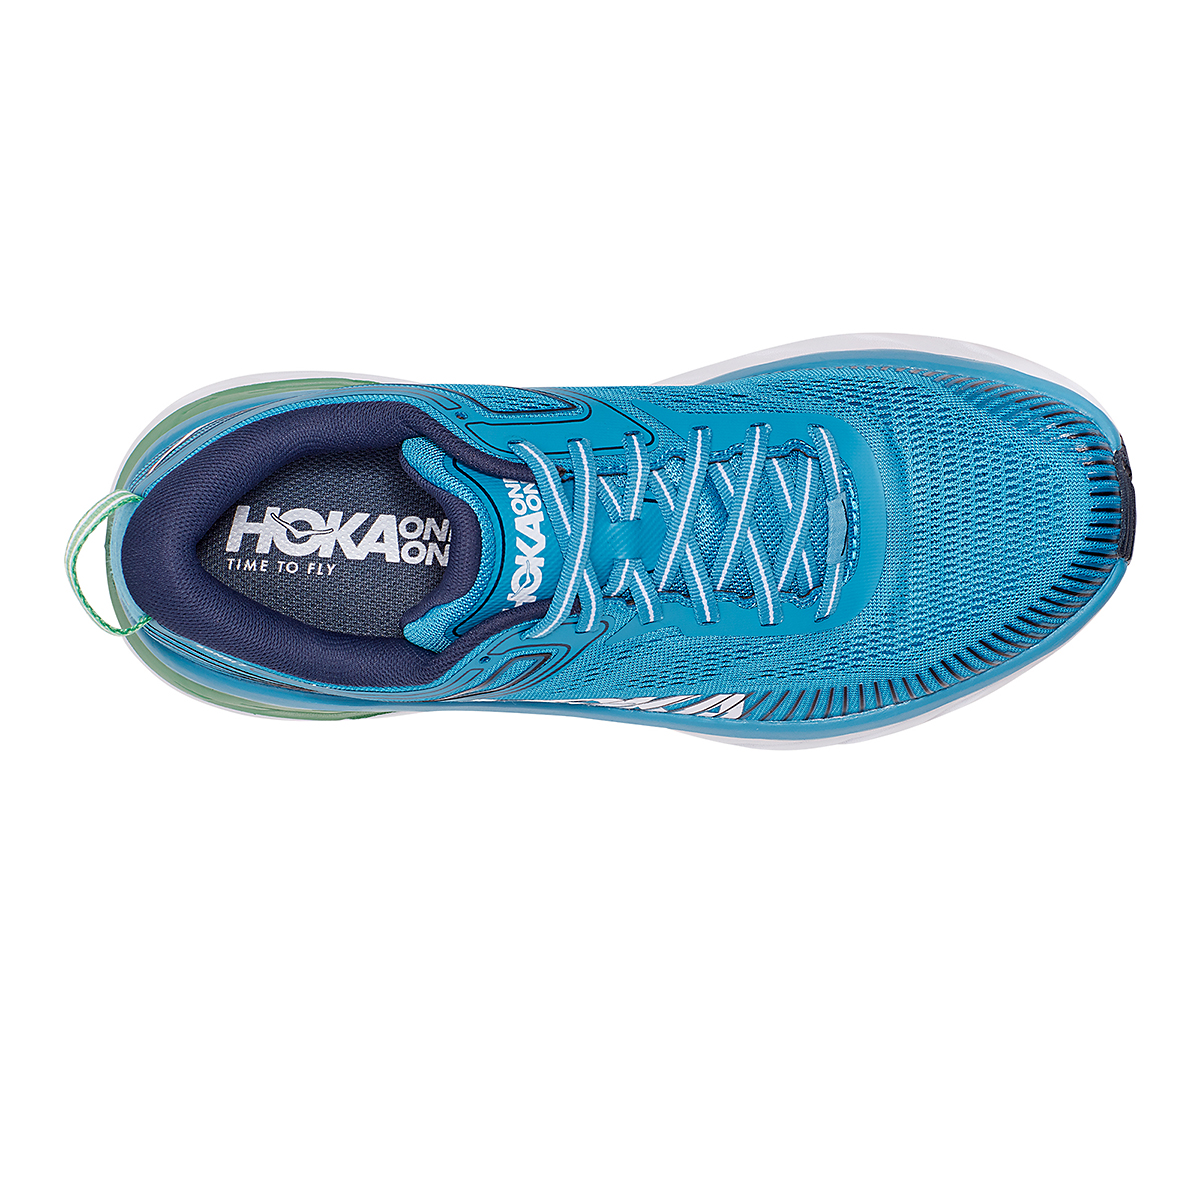 Men's Hoka One One Bondi 7 Running Shoe - Color: Blue Moon/Moonlit Ocean - Size: 7 - Width: Regular, Blue Moon/Moonlit Ocean, large, image 7